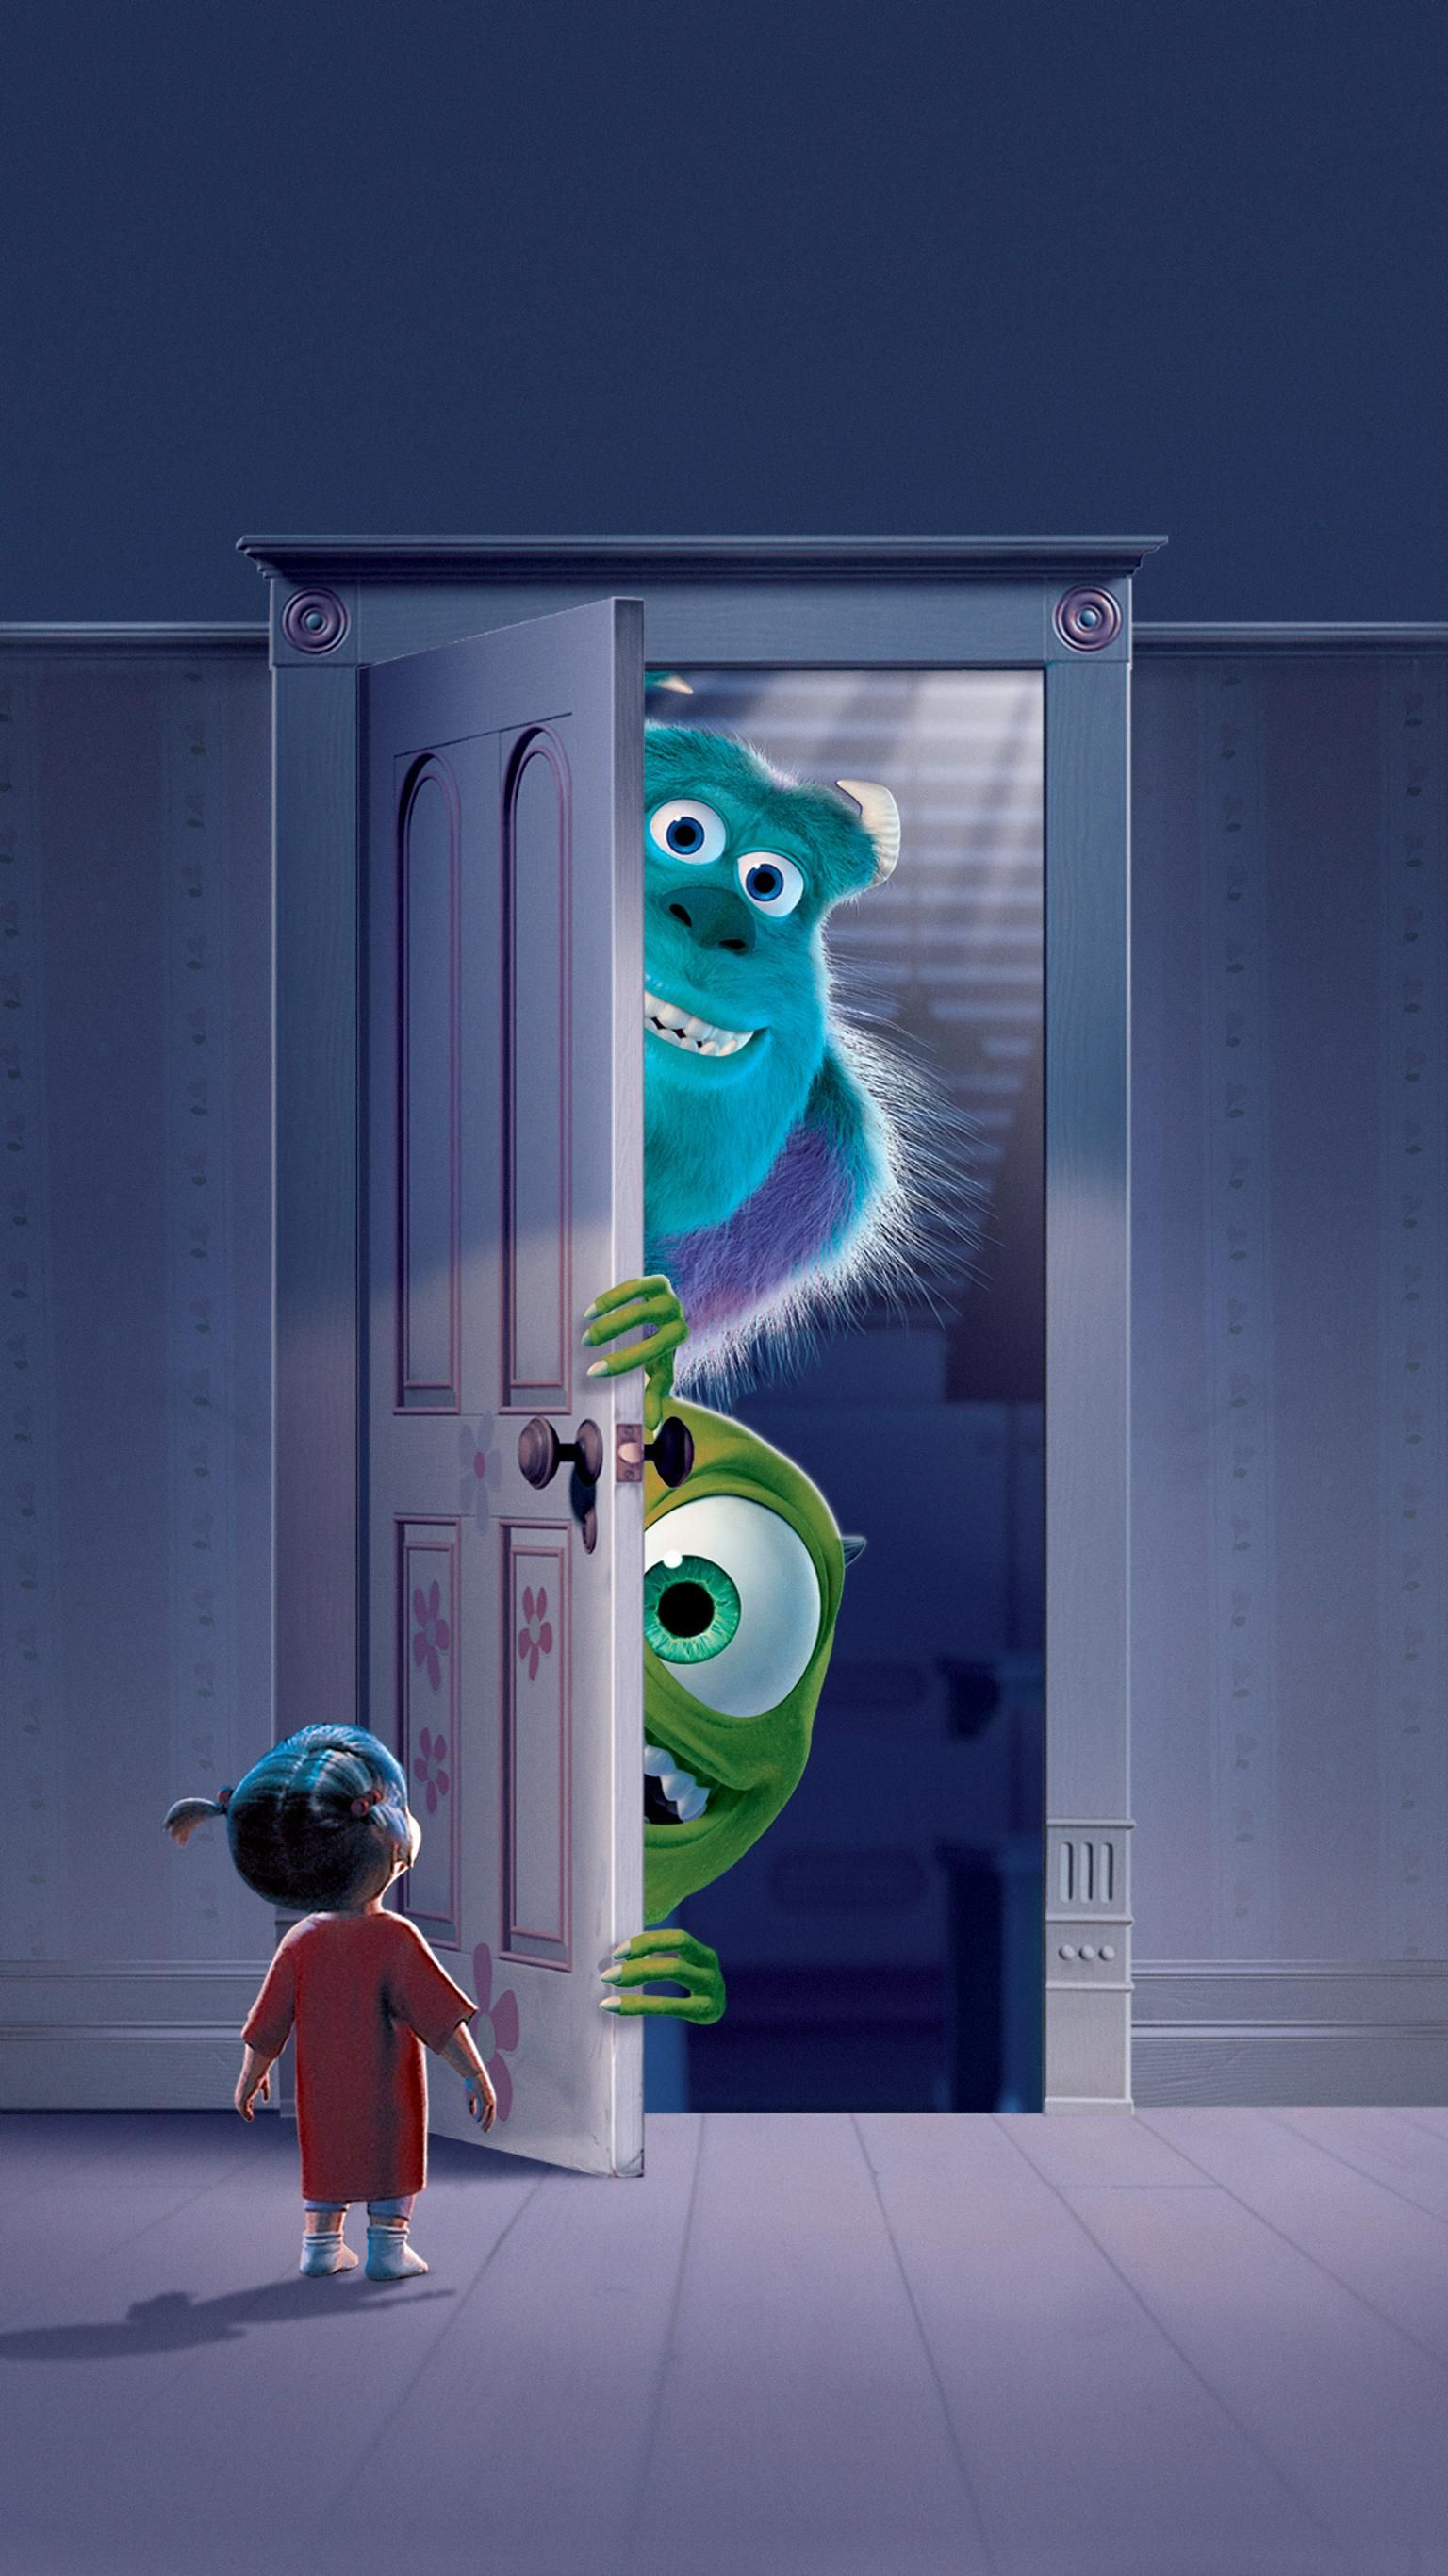 Monsters, Inc. (2001) Phone Wallpaper | Moviemania